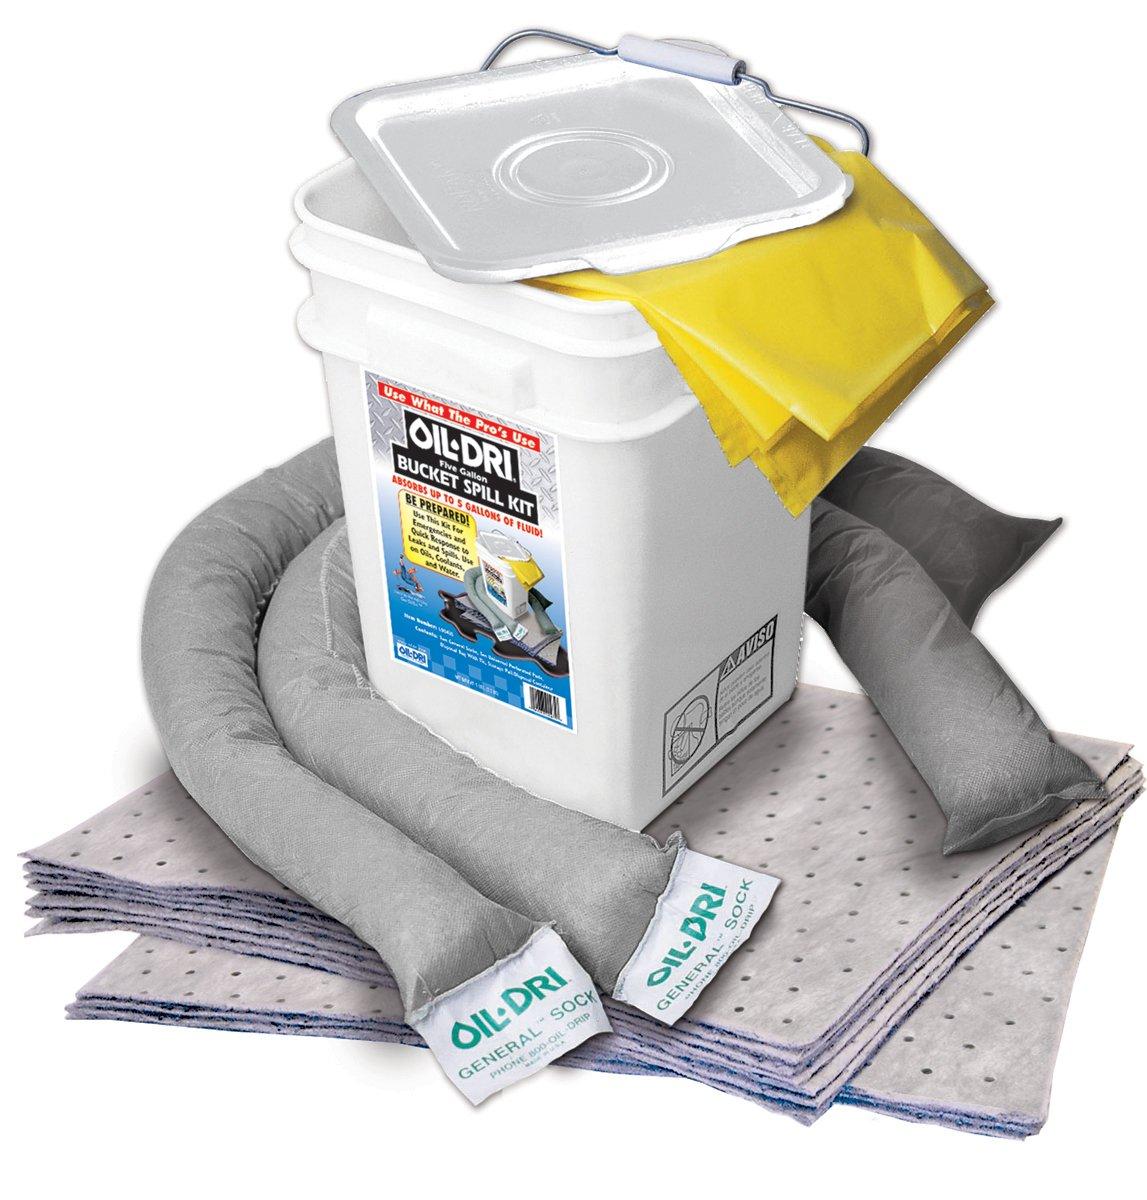 Oil-Dri L90435 Compact Universal 5-Gallon Bucket Spill Kit, 5-Gallon Maximum Absorption Capacity: Industrial Spill Response Kits: Industrial & Scientific